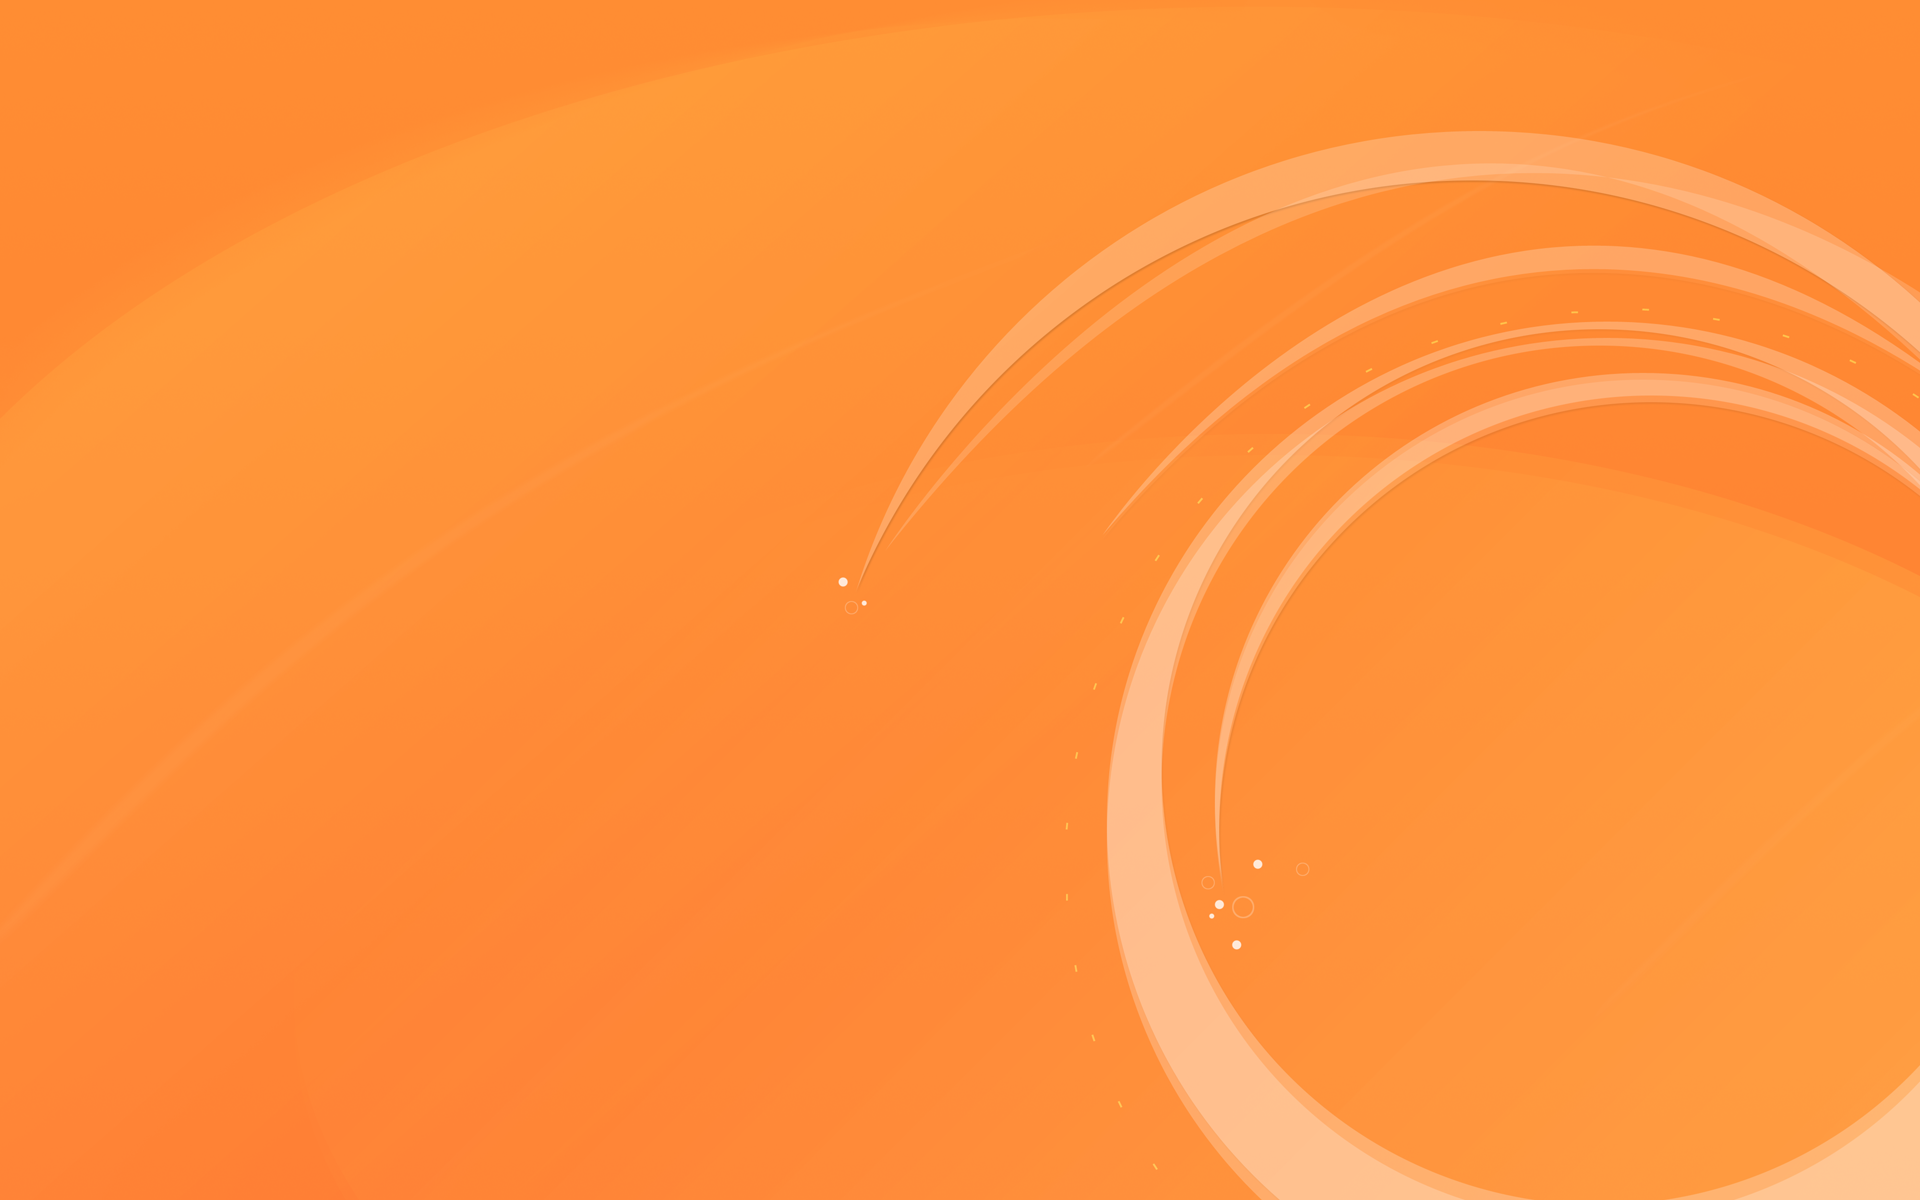 Orange Abstract wallpaper 96448 1920x1200